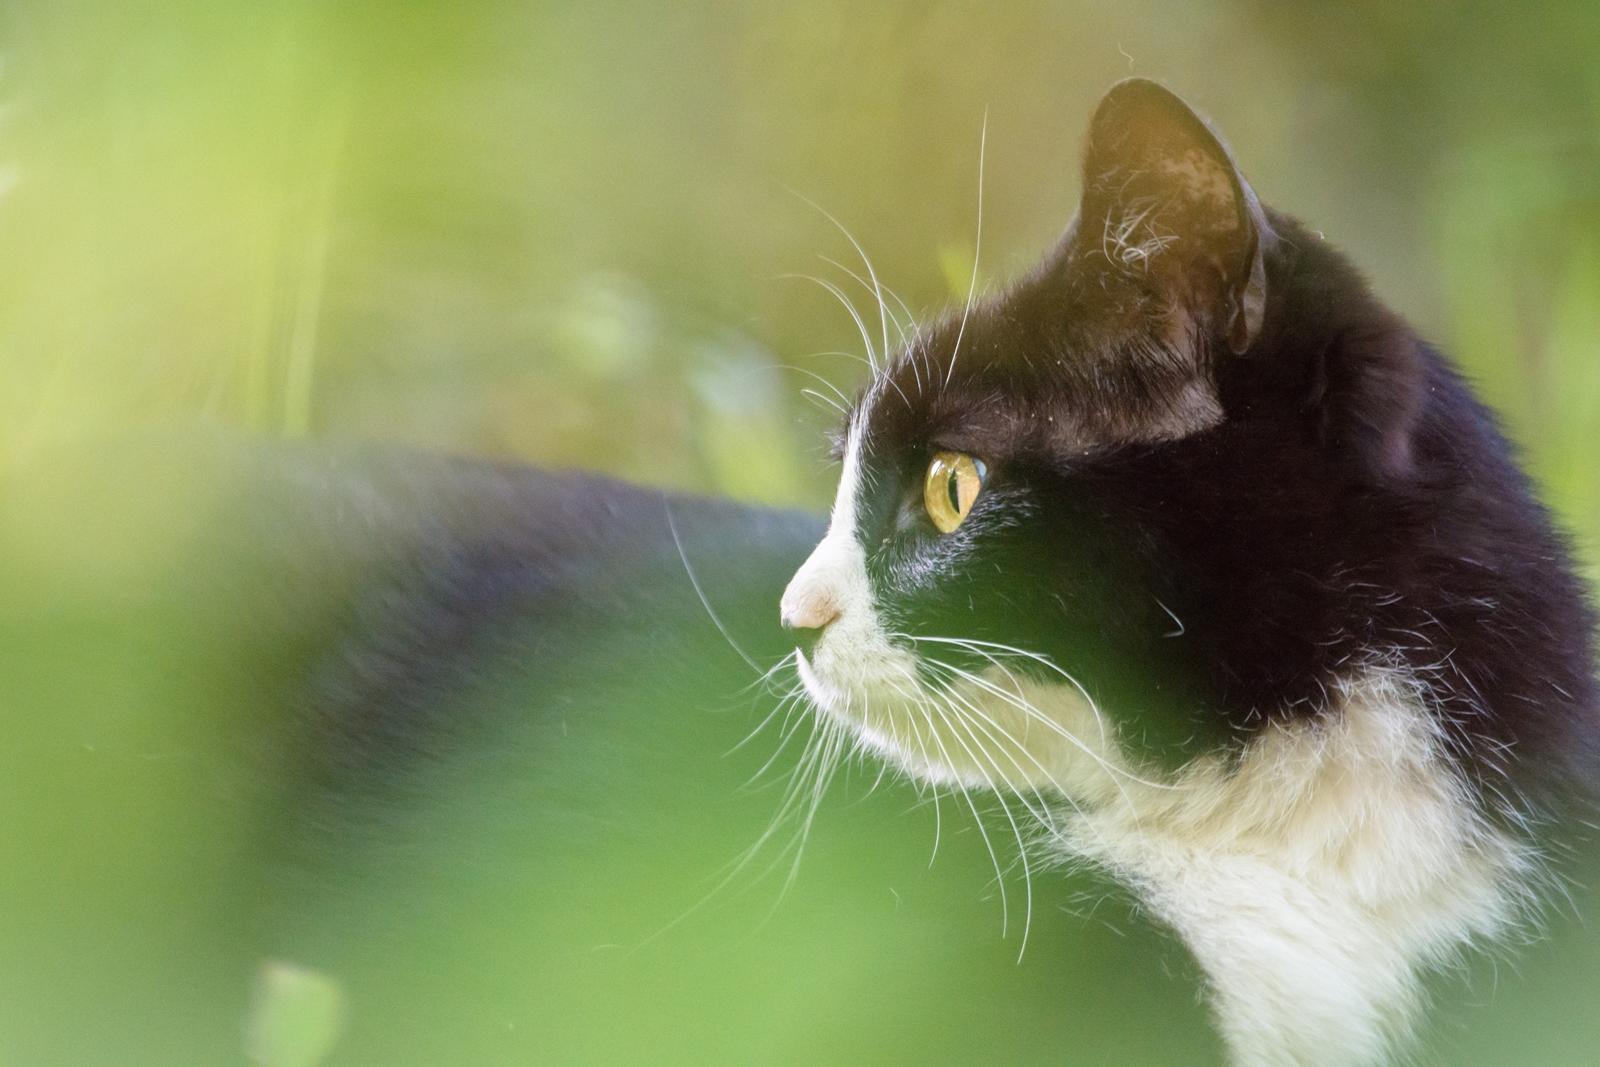 Photo: 茂みの奥の眼差し Eyes that is in the inner part of a bushes.  ひっそりと茂みの奥に光る眼差し そこは木漏れ日そそぐお気に入りの場所 行き交う人をのんびり見ながら ゆっくりと朝のひとときを過ごす  Stray cat. (ノラ猫)  #cooljapan #365cooljapanmay #straycat #cat #sigma #kawaii  Nikon D7200 SIGMA APO 50-500mm F5-6.3 DG OS HSM [ Day358, May 5th ] (4枚追加:Added 4 photo)